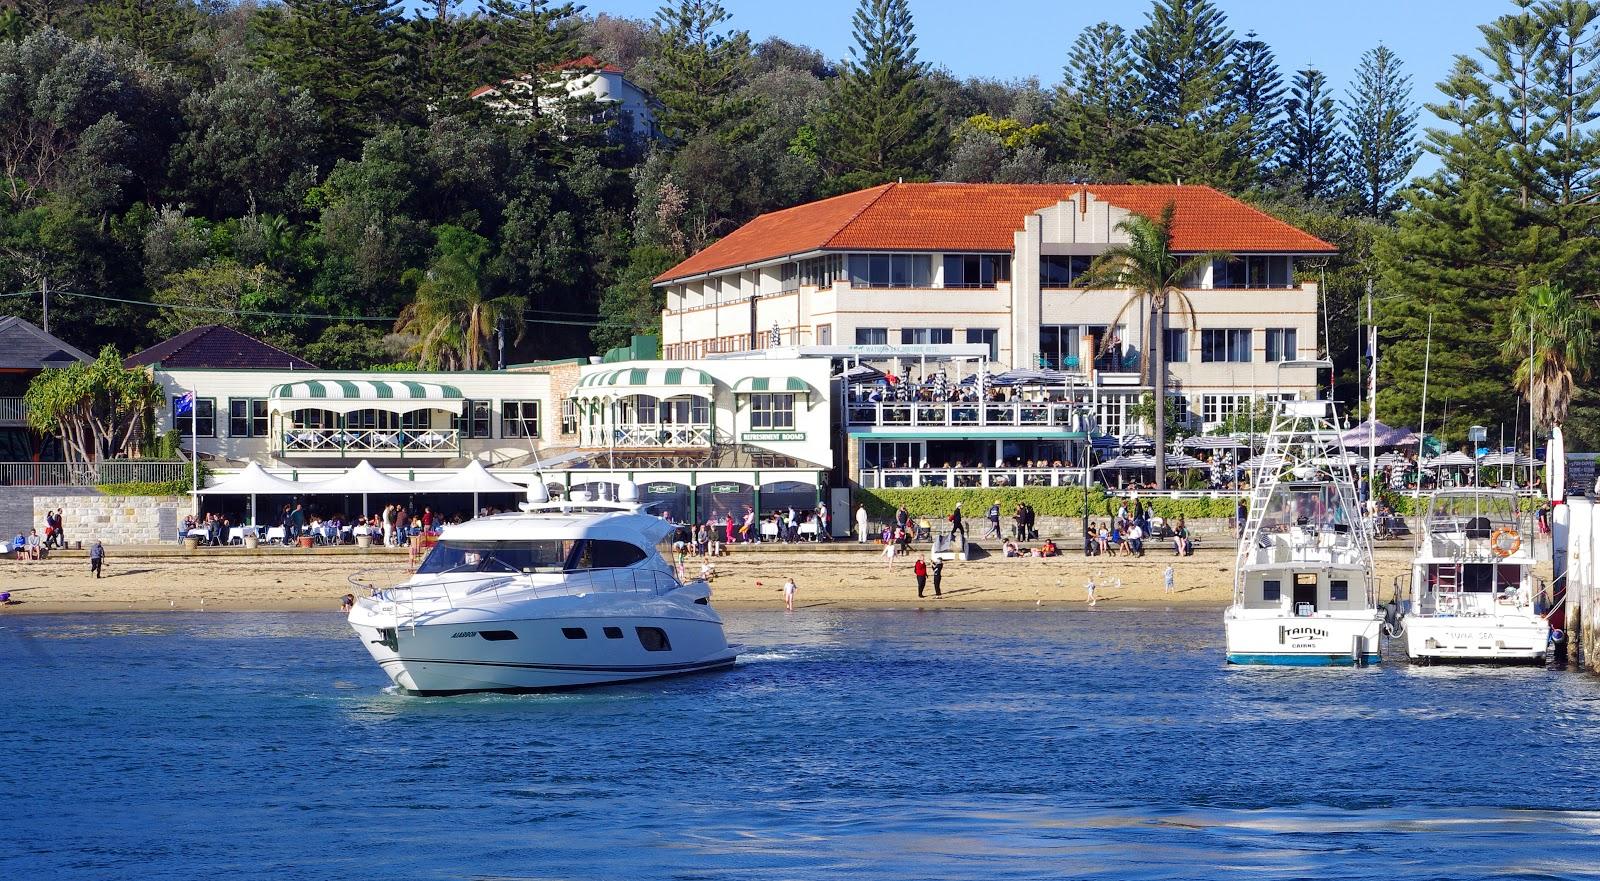 Watsons bay luxury hotel